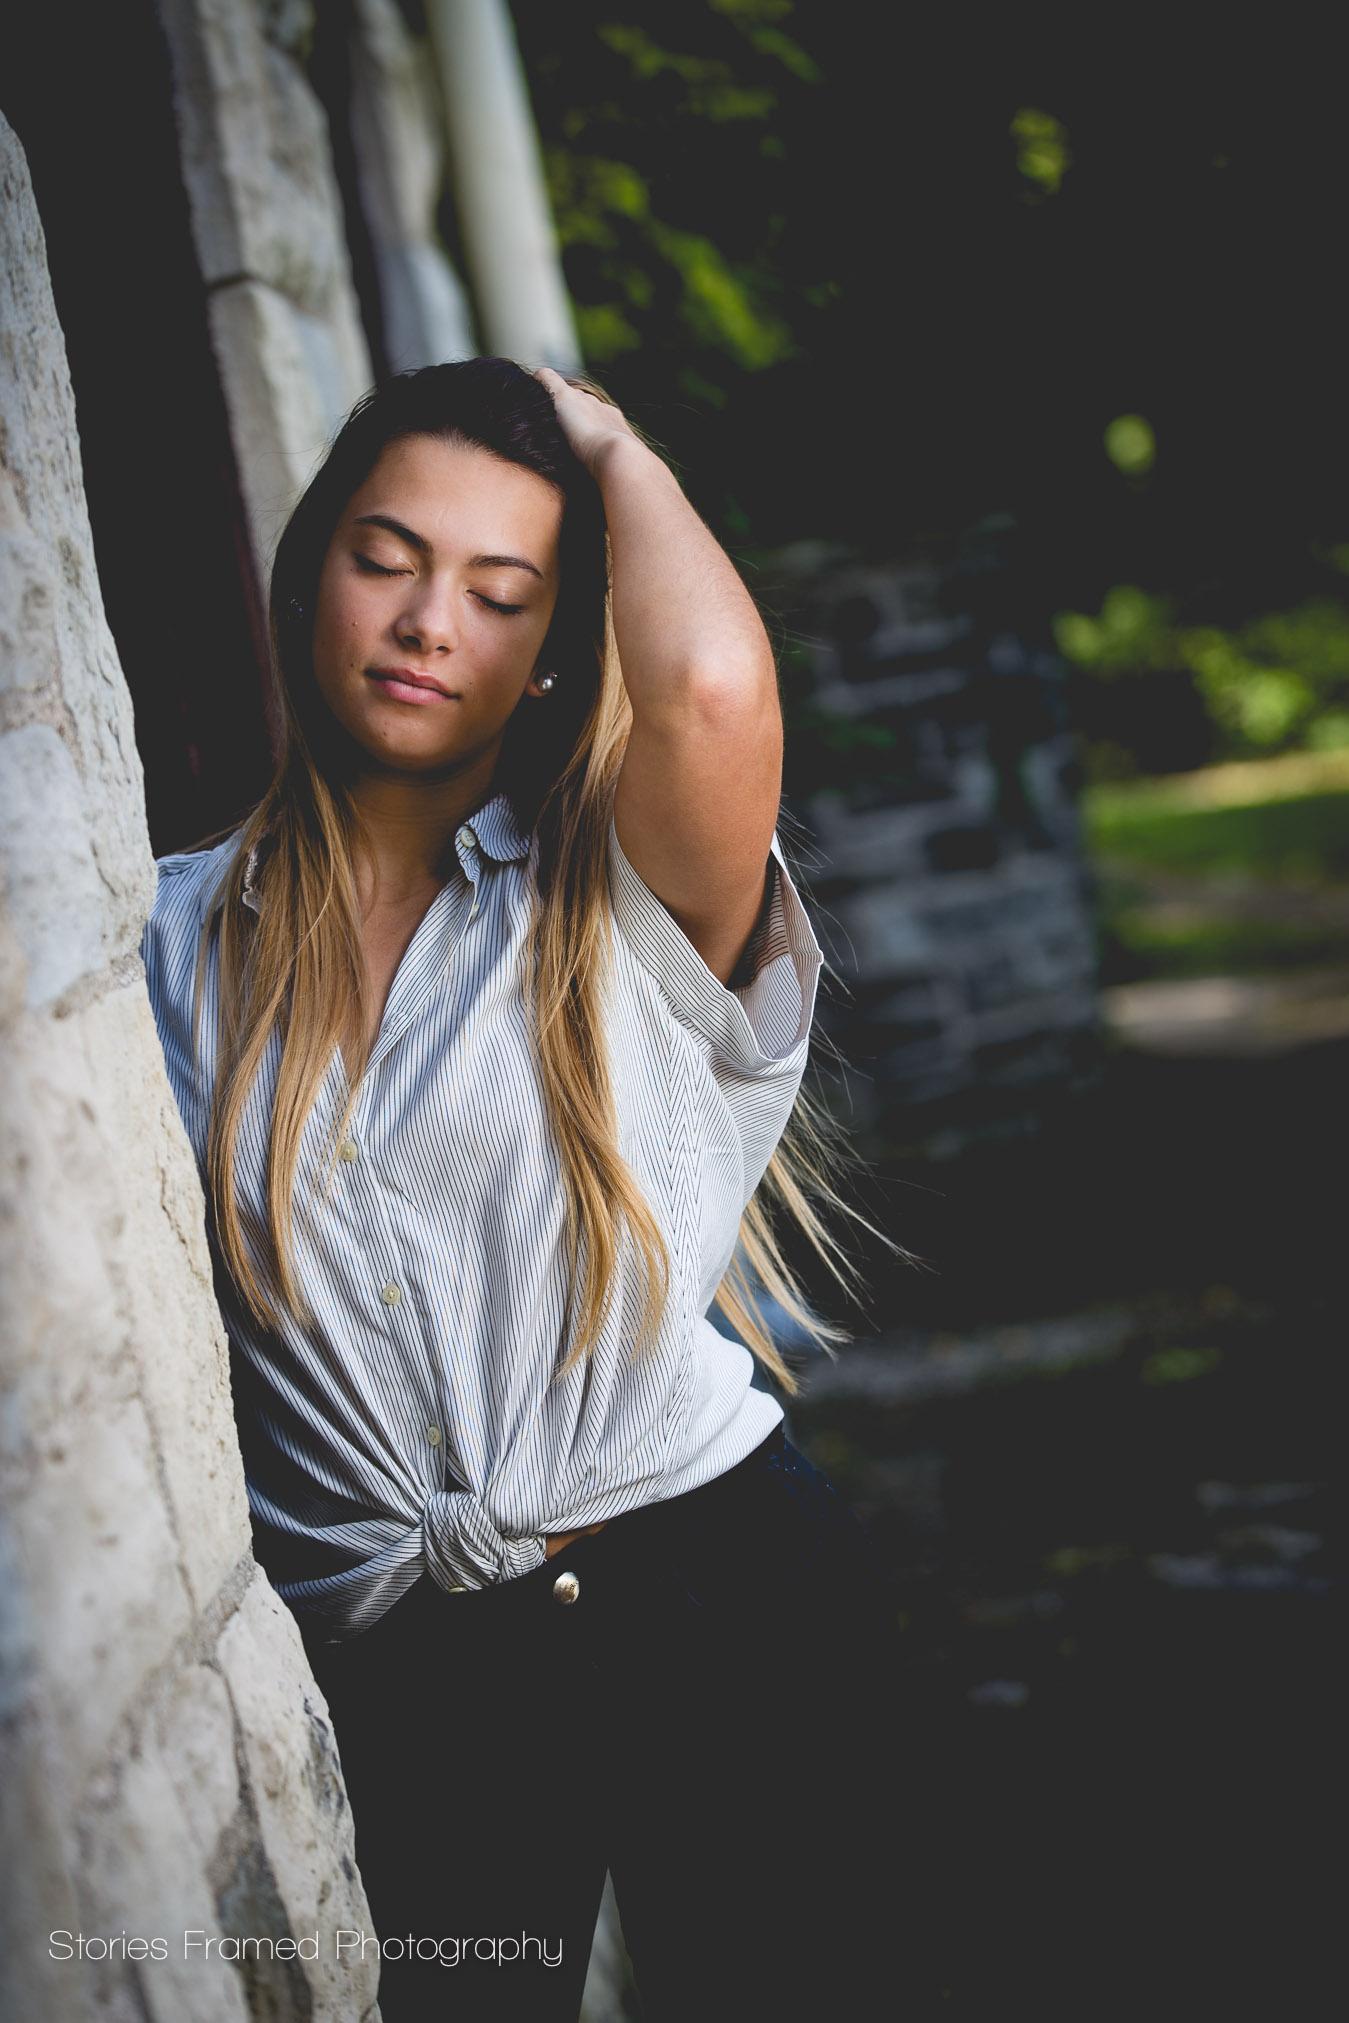 girl-eyes-closed-by-stone-wall.jpg